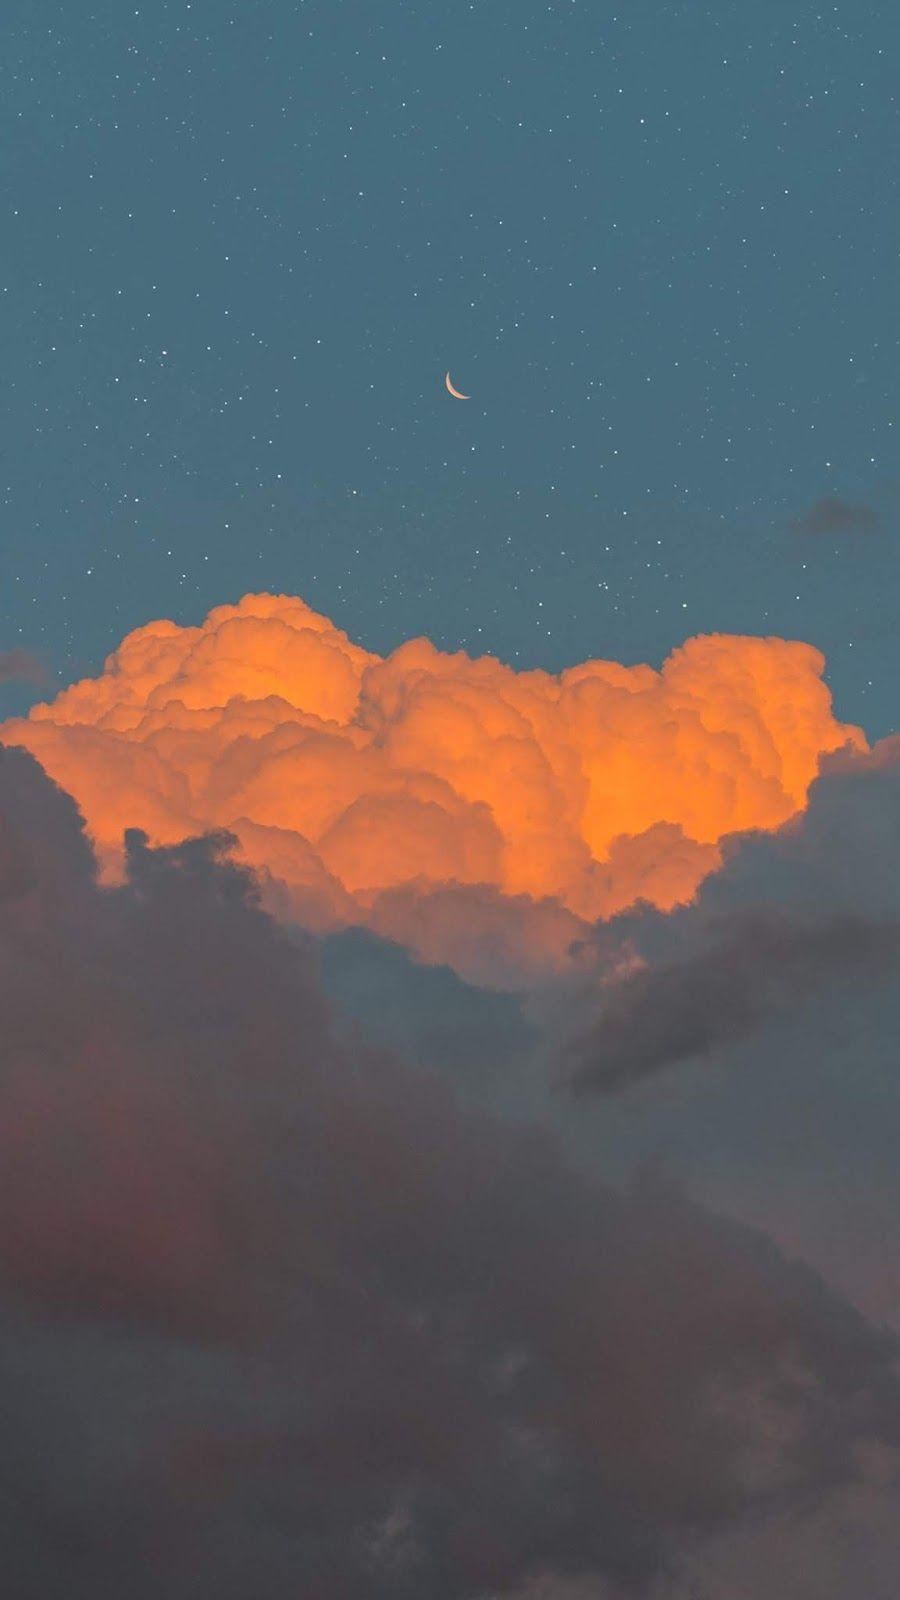 Crescent Moon In The Cloudy Sky Gambar Awan Foto Abstrak